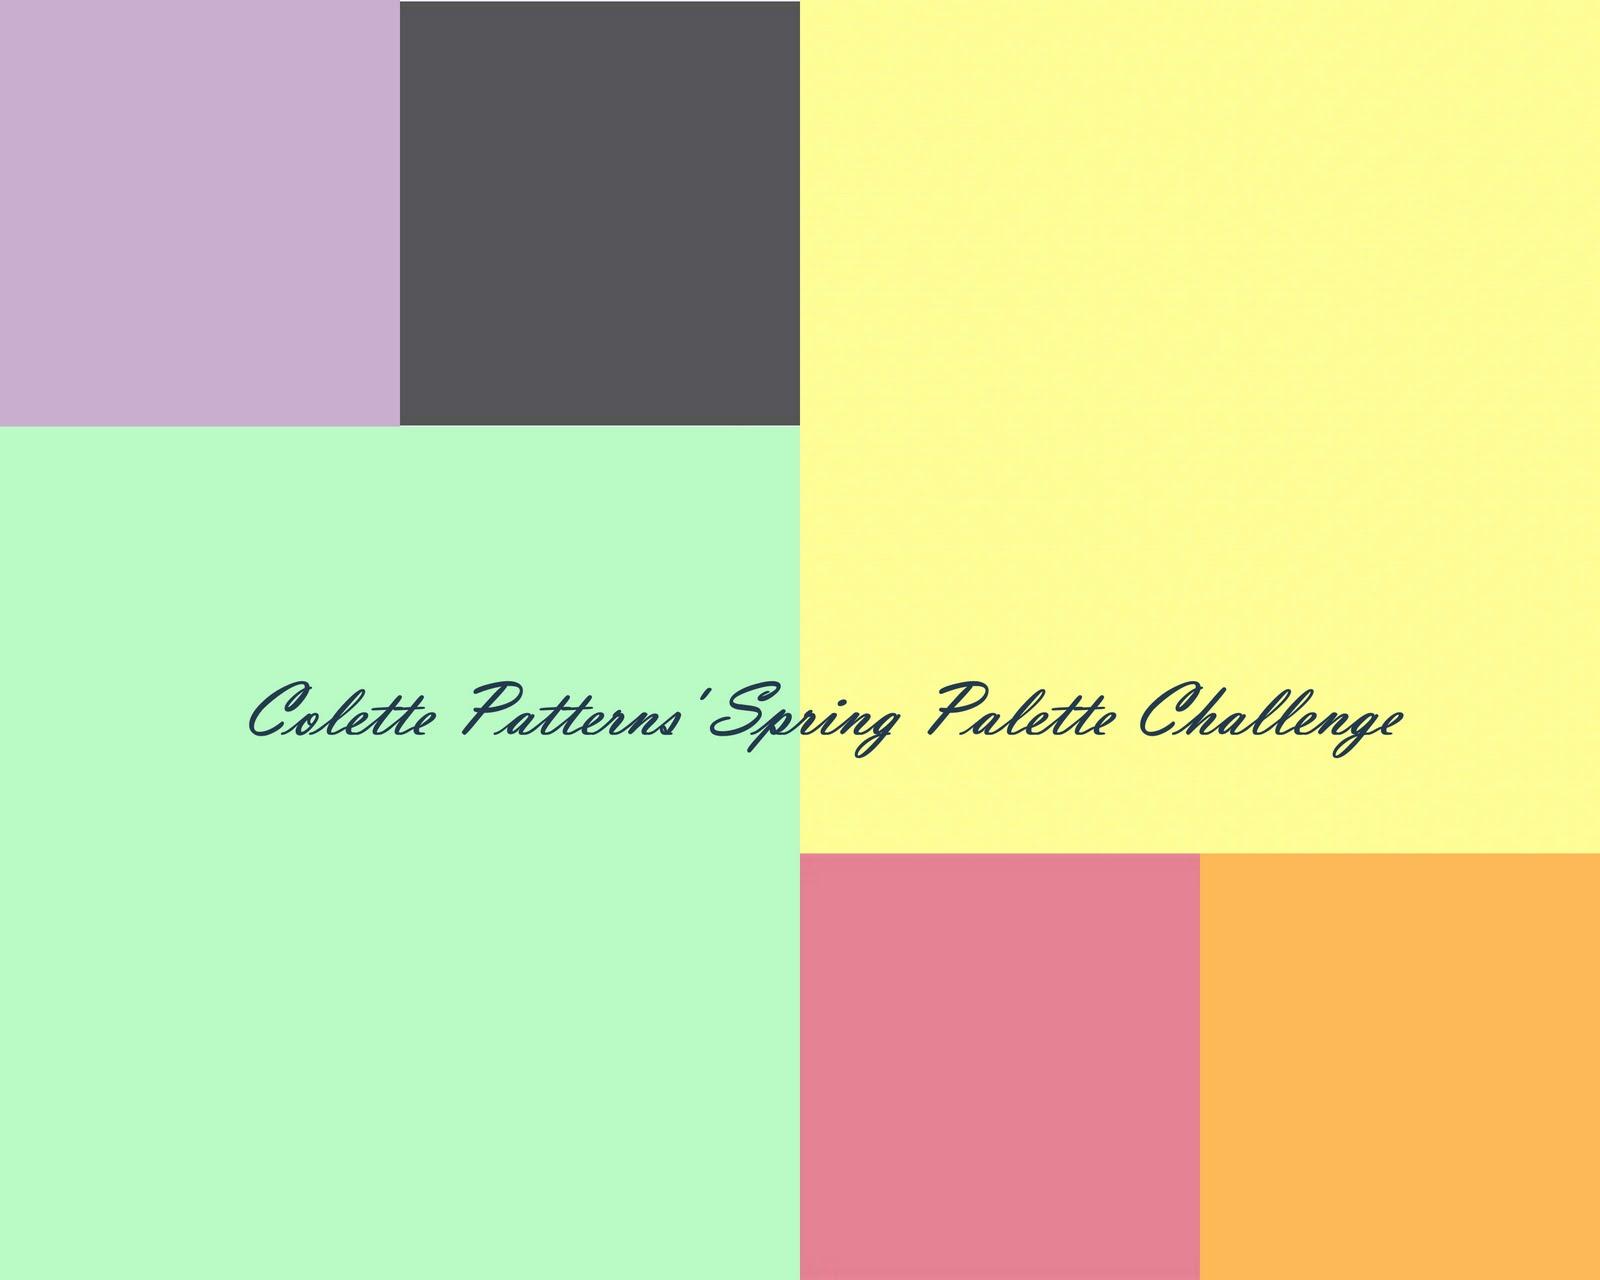 spring palette challege - Mint Green Color Scheme